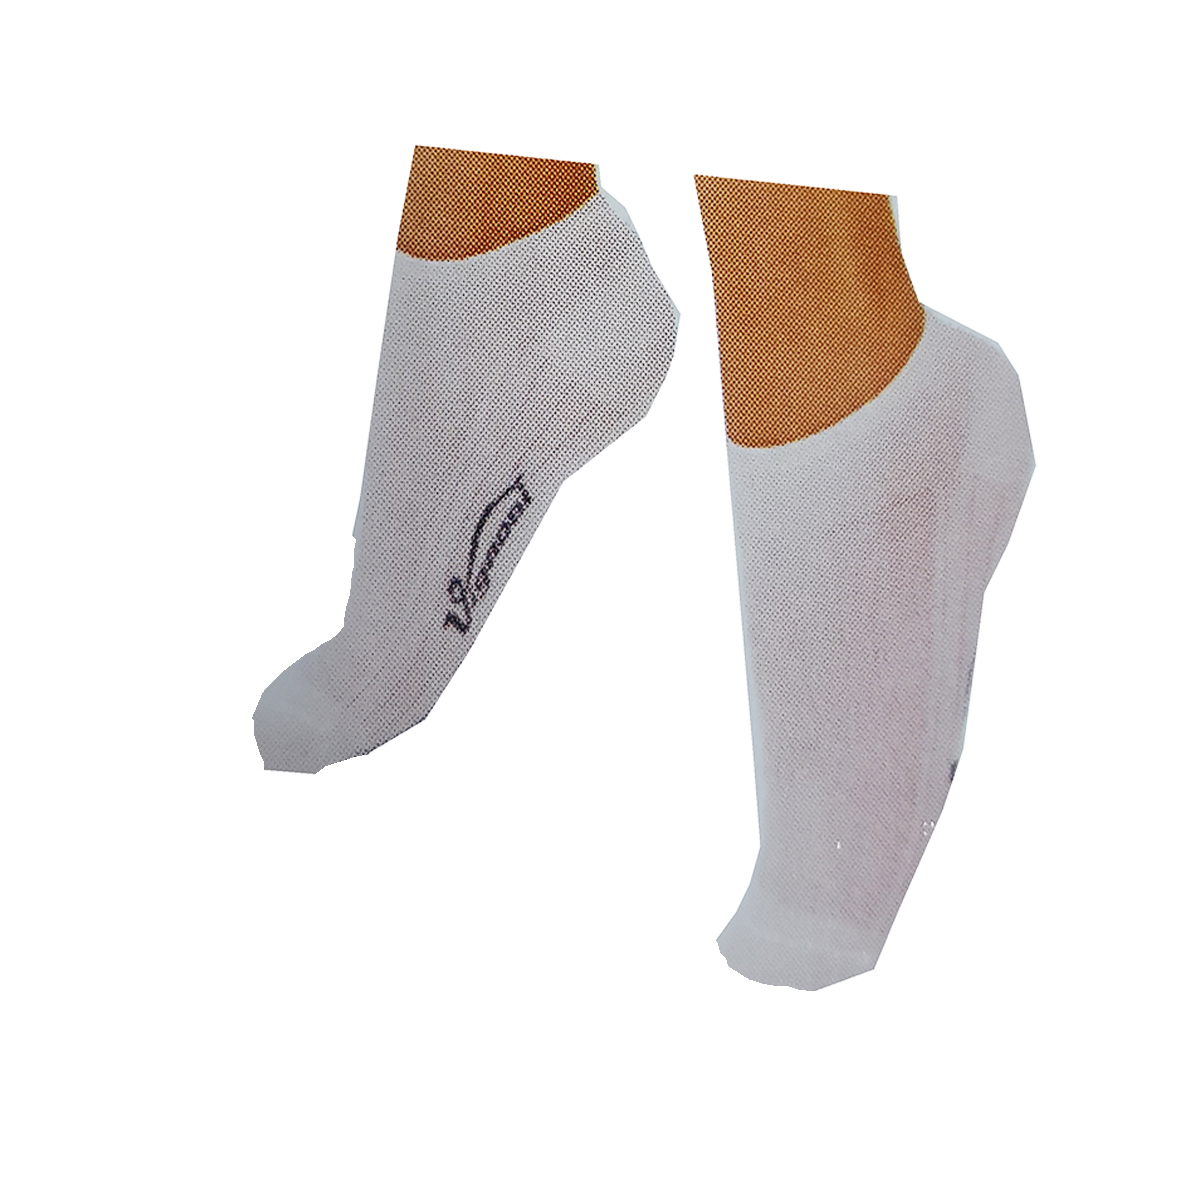 Calzini 12 paia bianchi unisex minicalze cotone corto calza donna uomo